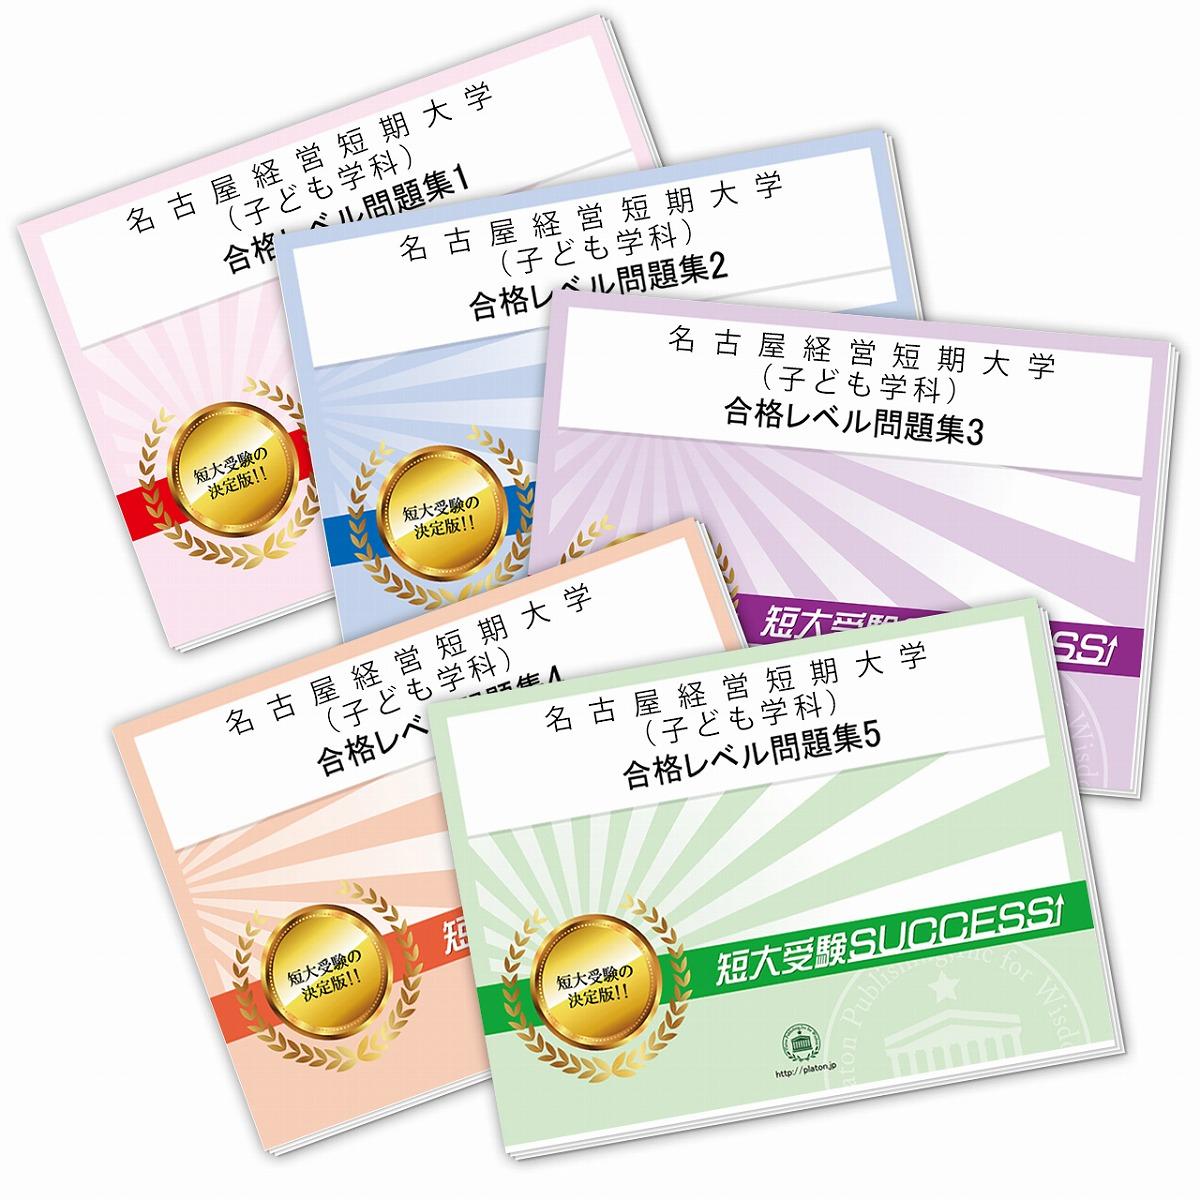 【送料・代引手数料無料】名古屋経営短期大学(子ども学科)受験合格セット(5冊)